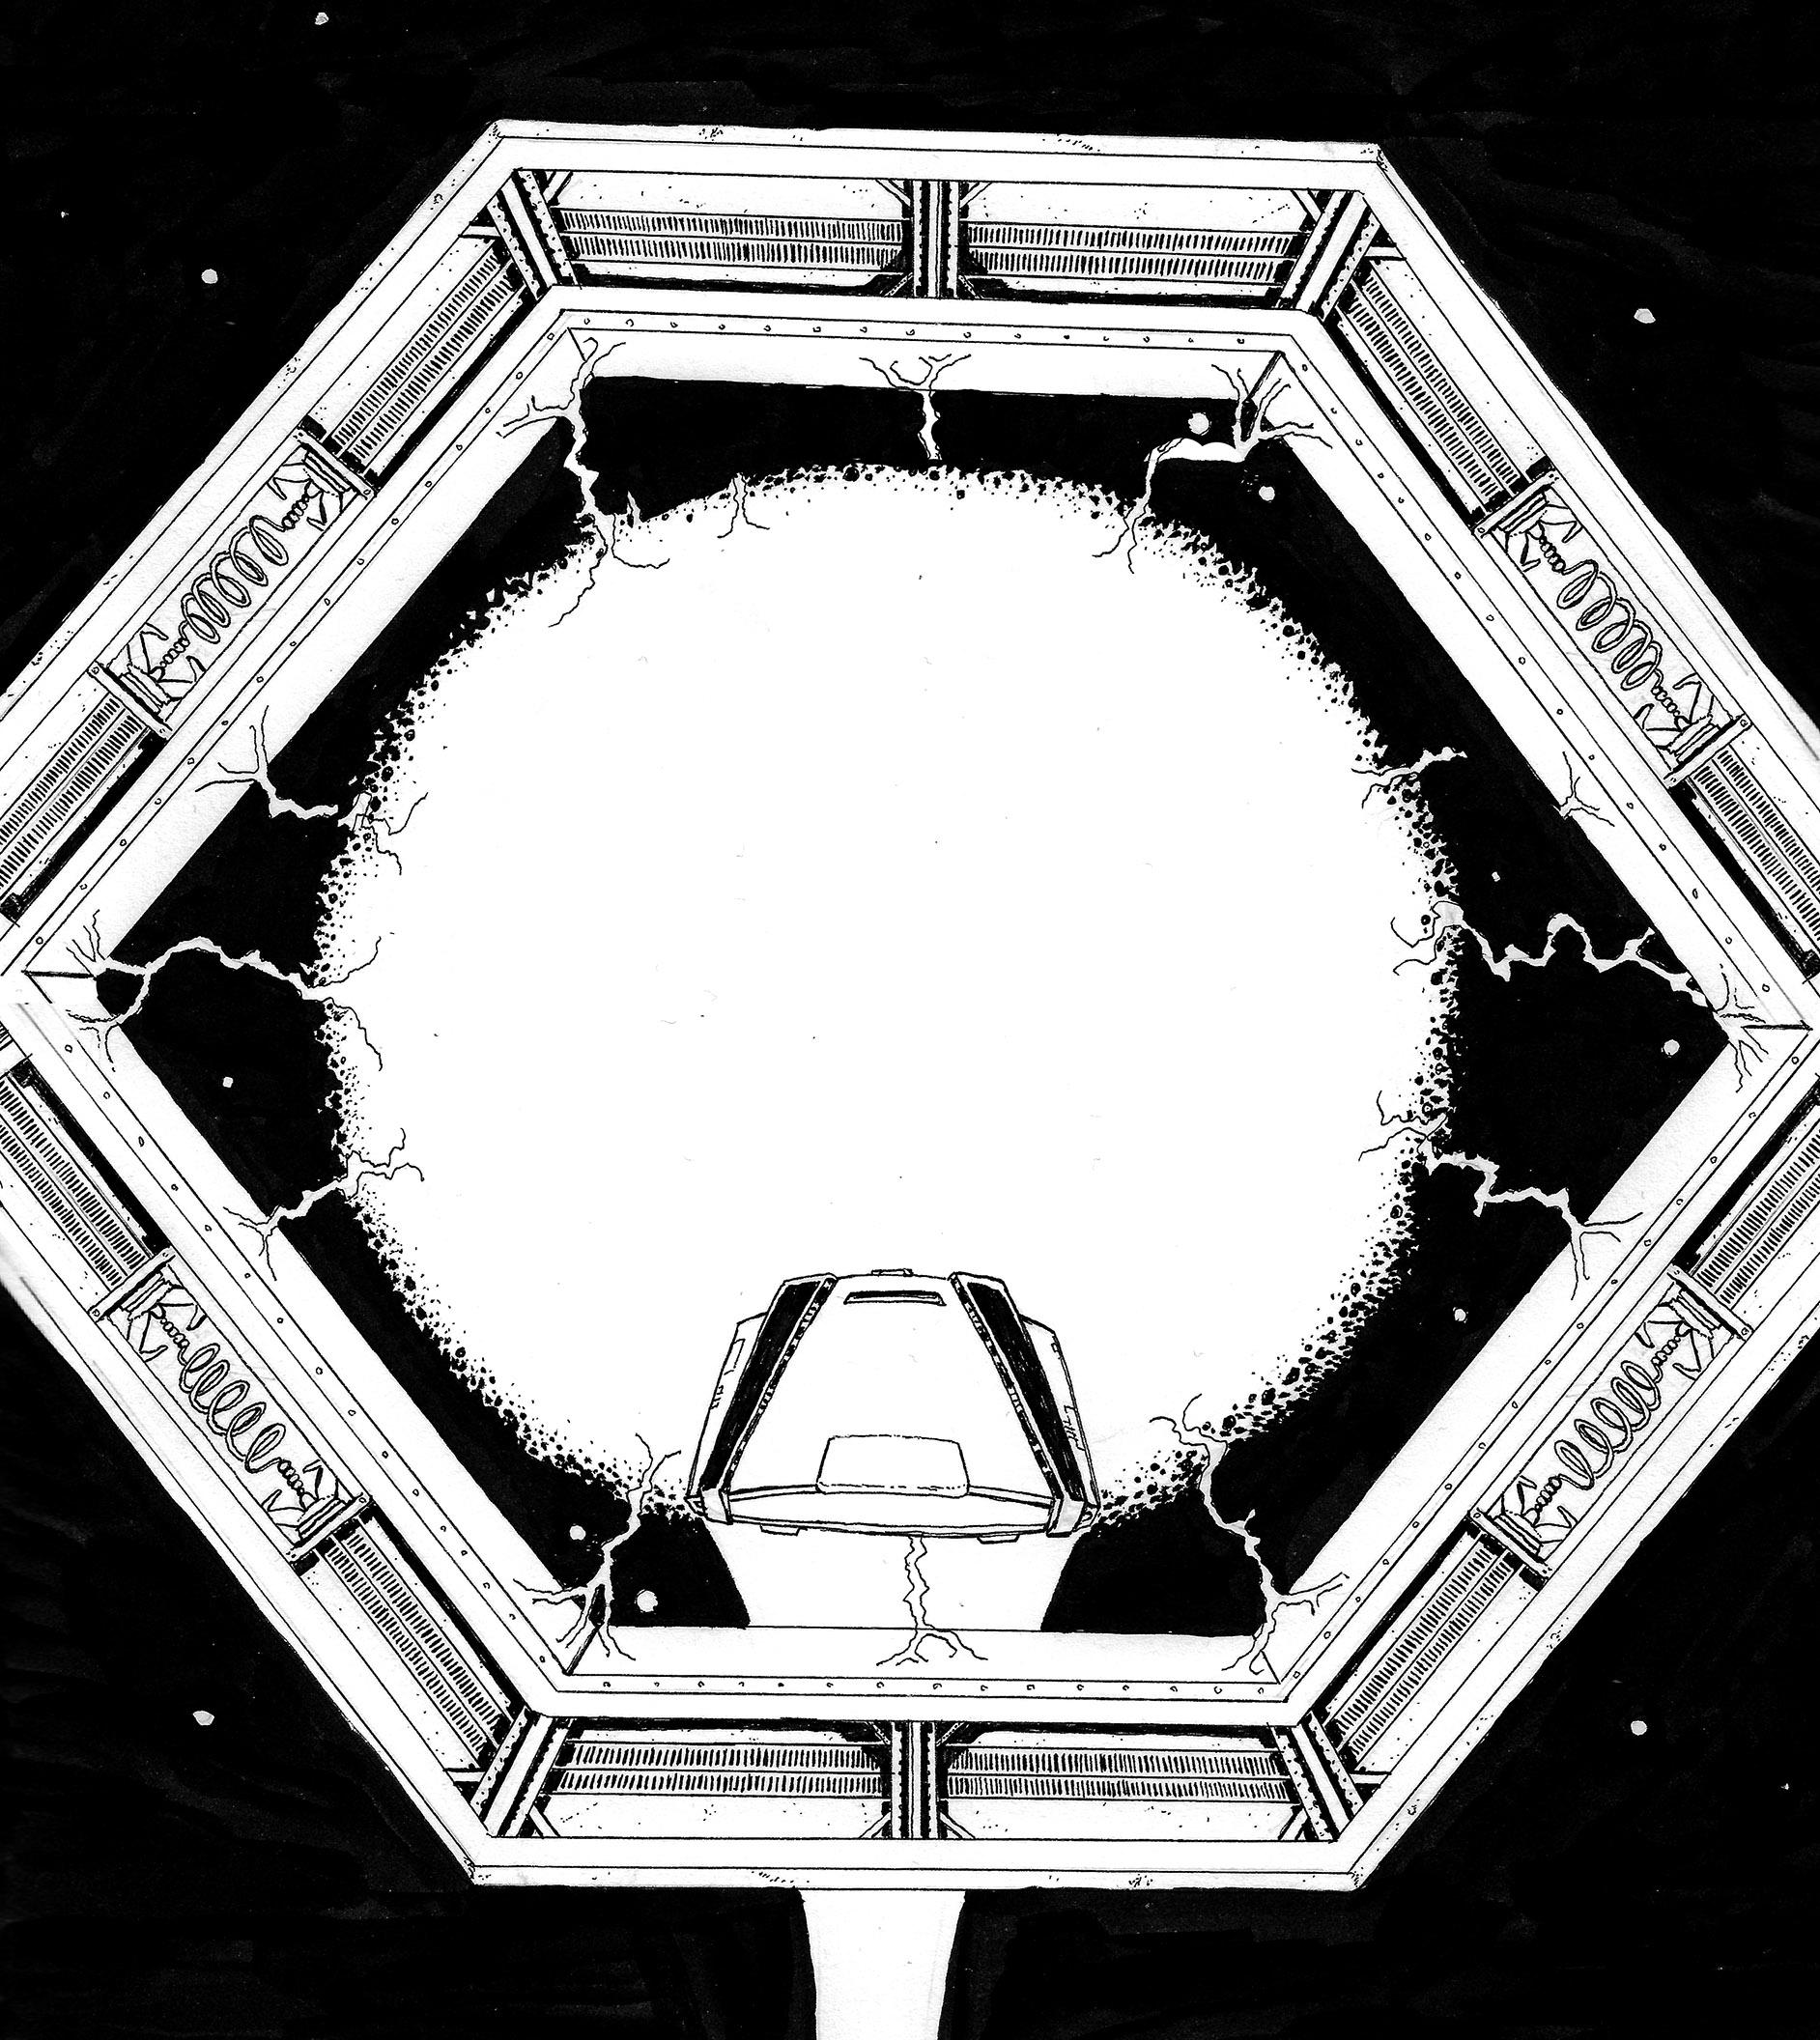 al3-coversketch.jpg